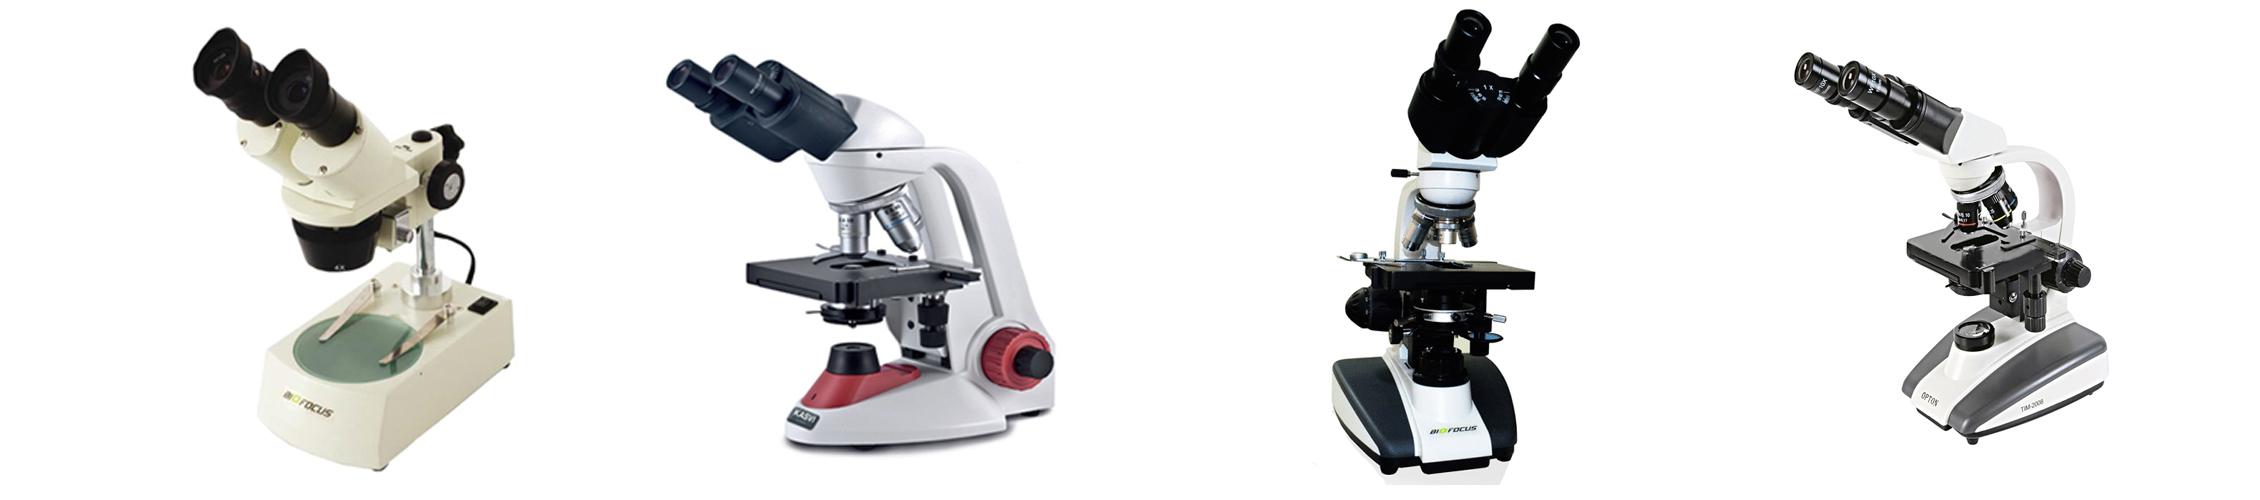 Microscópio Óptico (IMAGEM MERAMENTE ILUSTRATIVA)